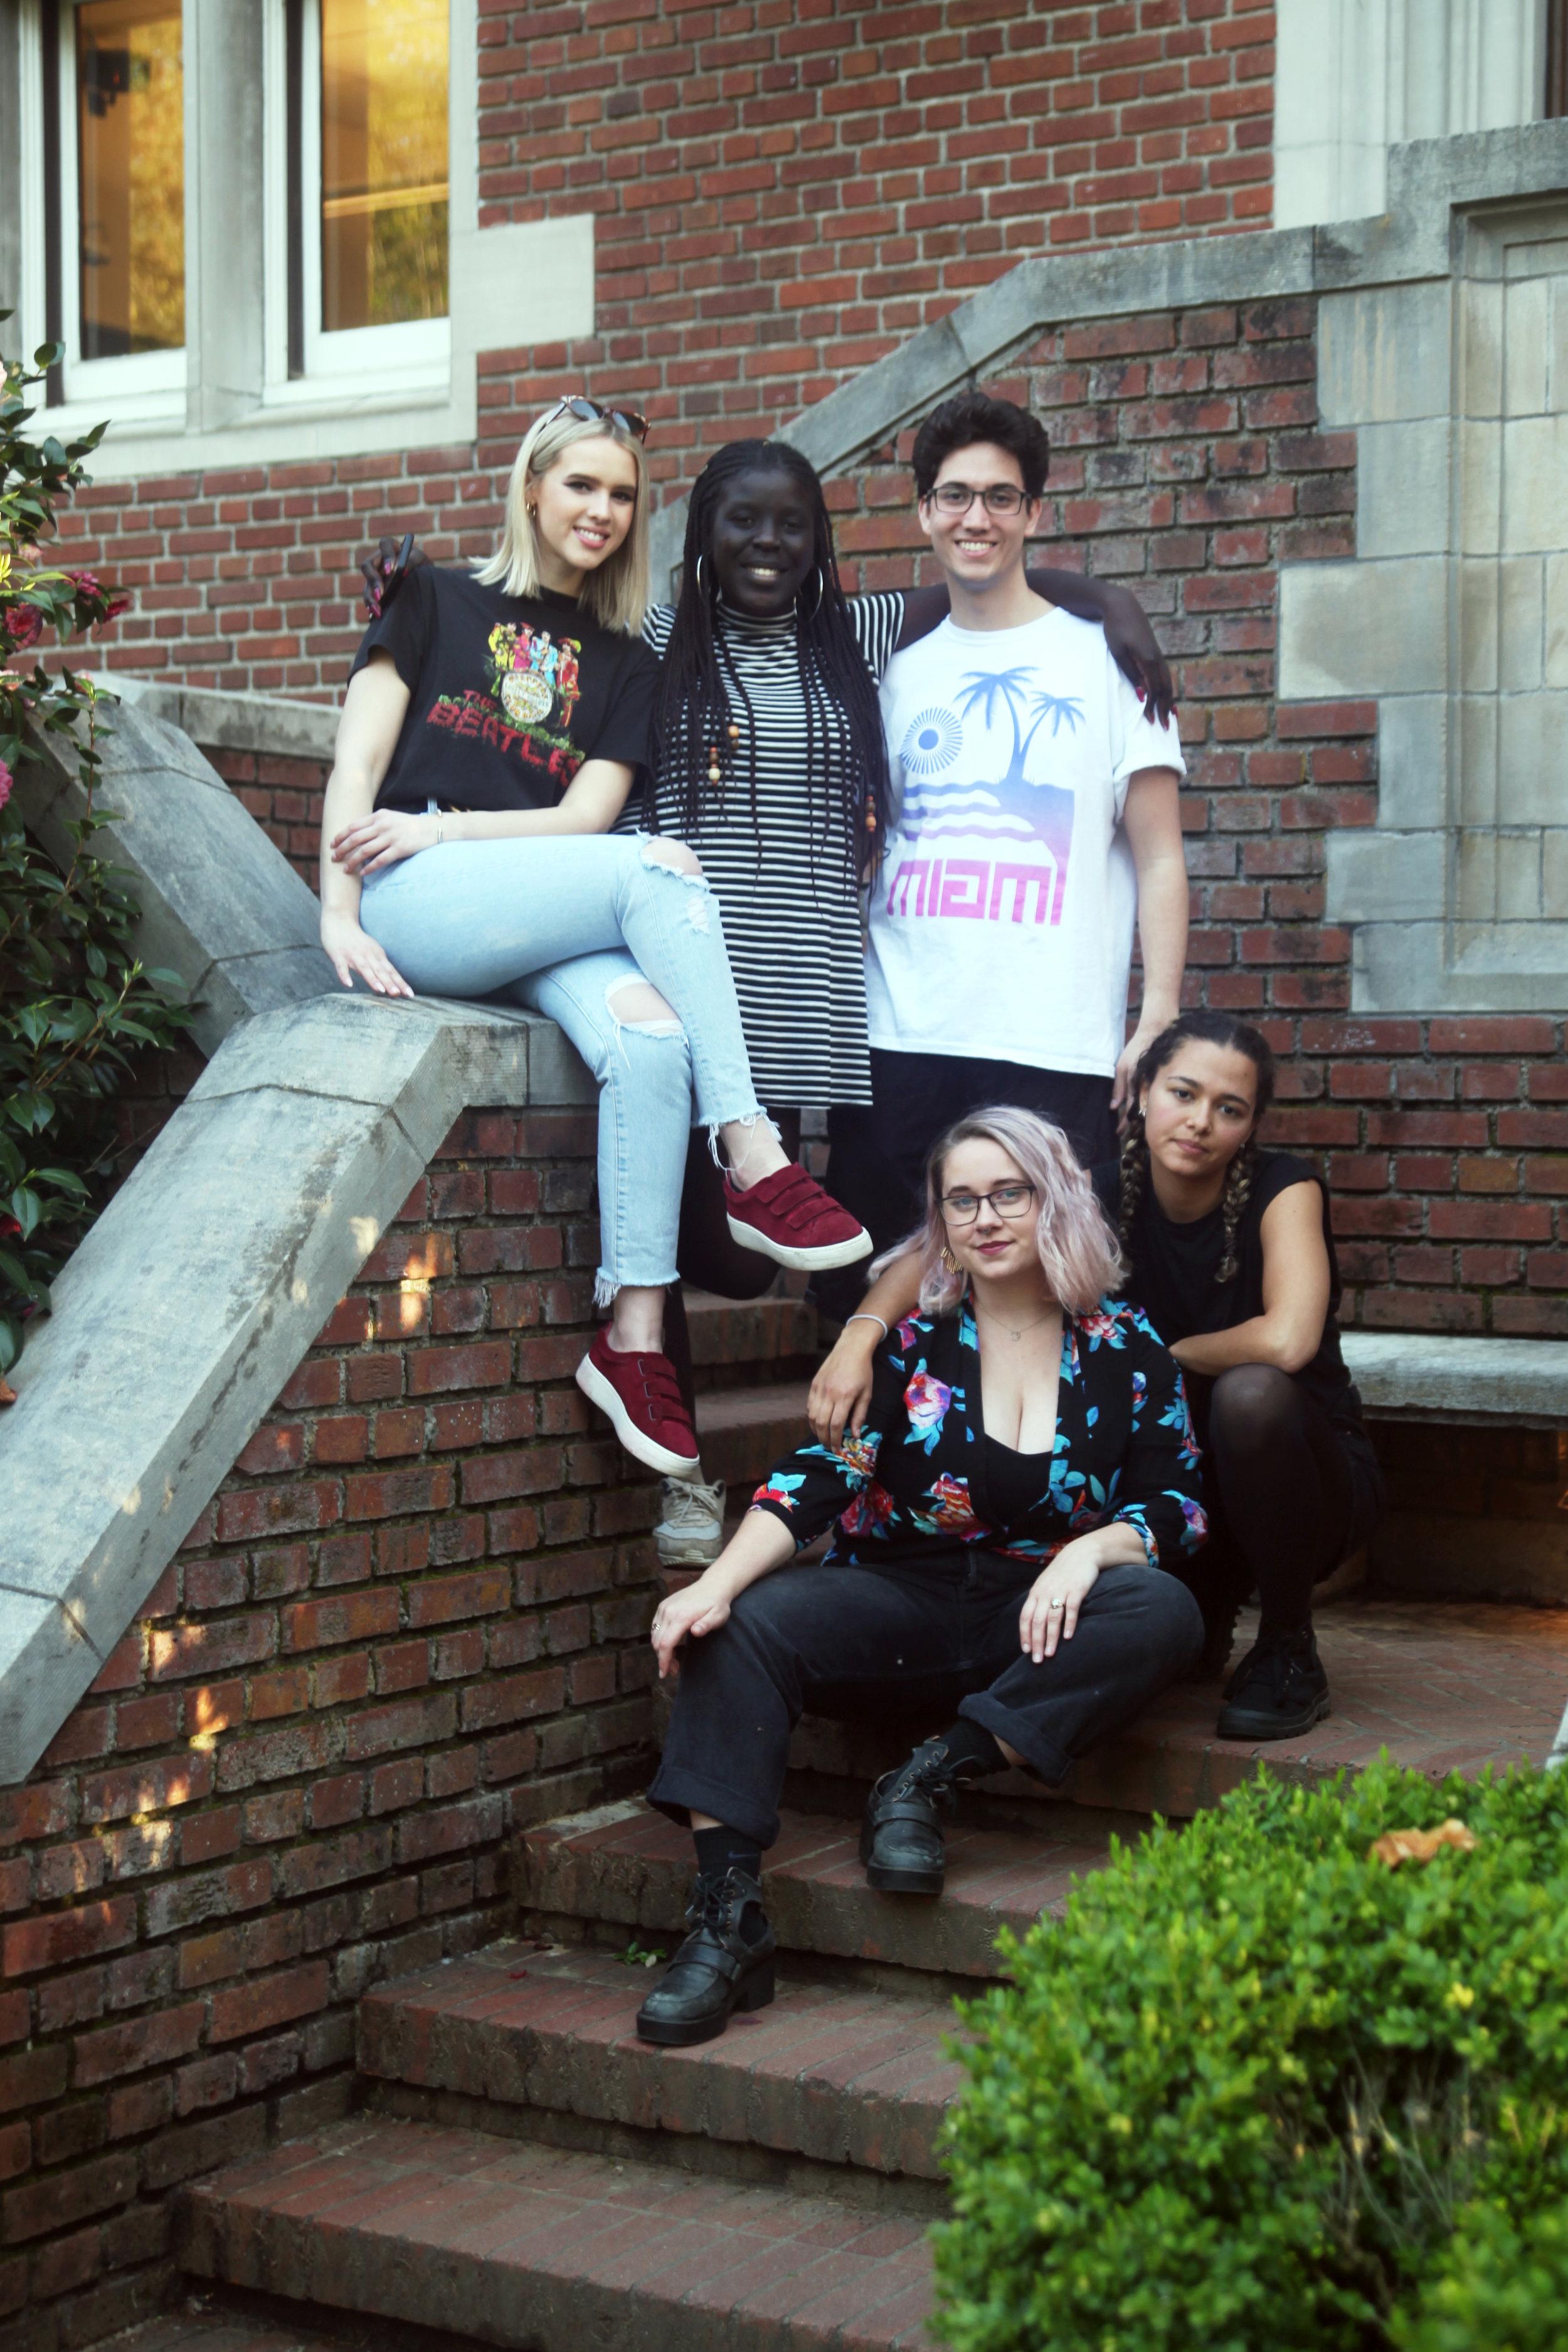 Renn Fayre Czars (back row) Kieran Nugent, Aminta Gueye, David James, (front row) Brenna Intemann-Milligan, and Leensa Gheneti. Photo by Claire Pask.